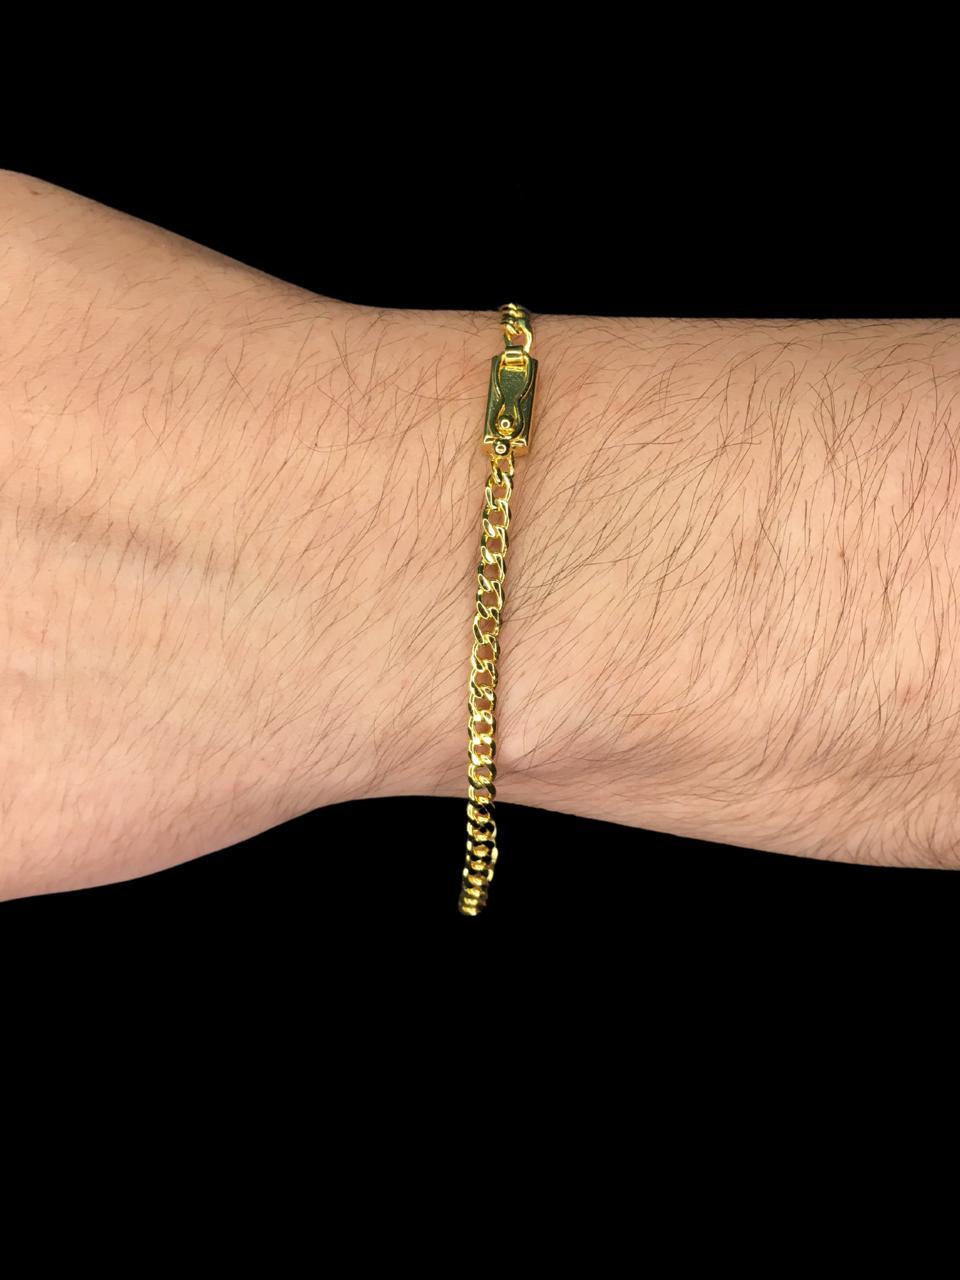 Pulseira grumet -  3 milímetros - 22 Centímetros - fecho Gaveta - Banhado a ouro 18 k